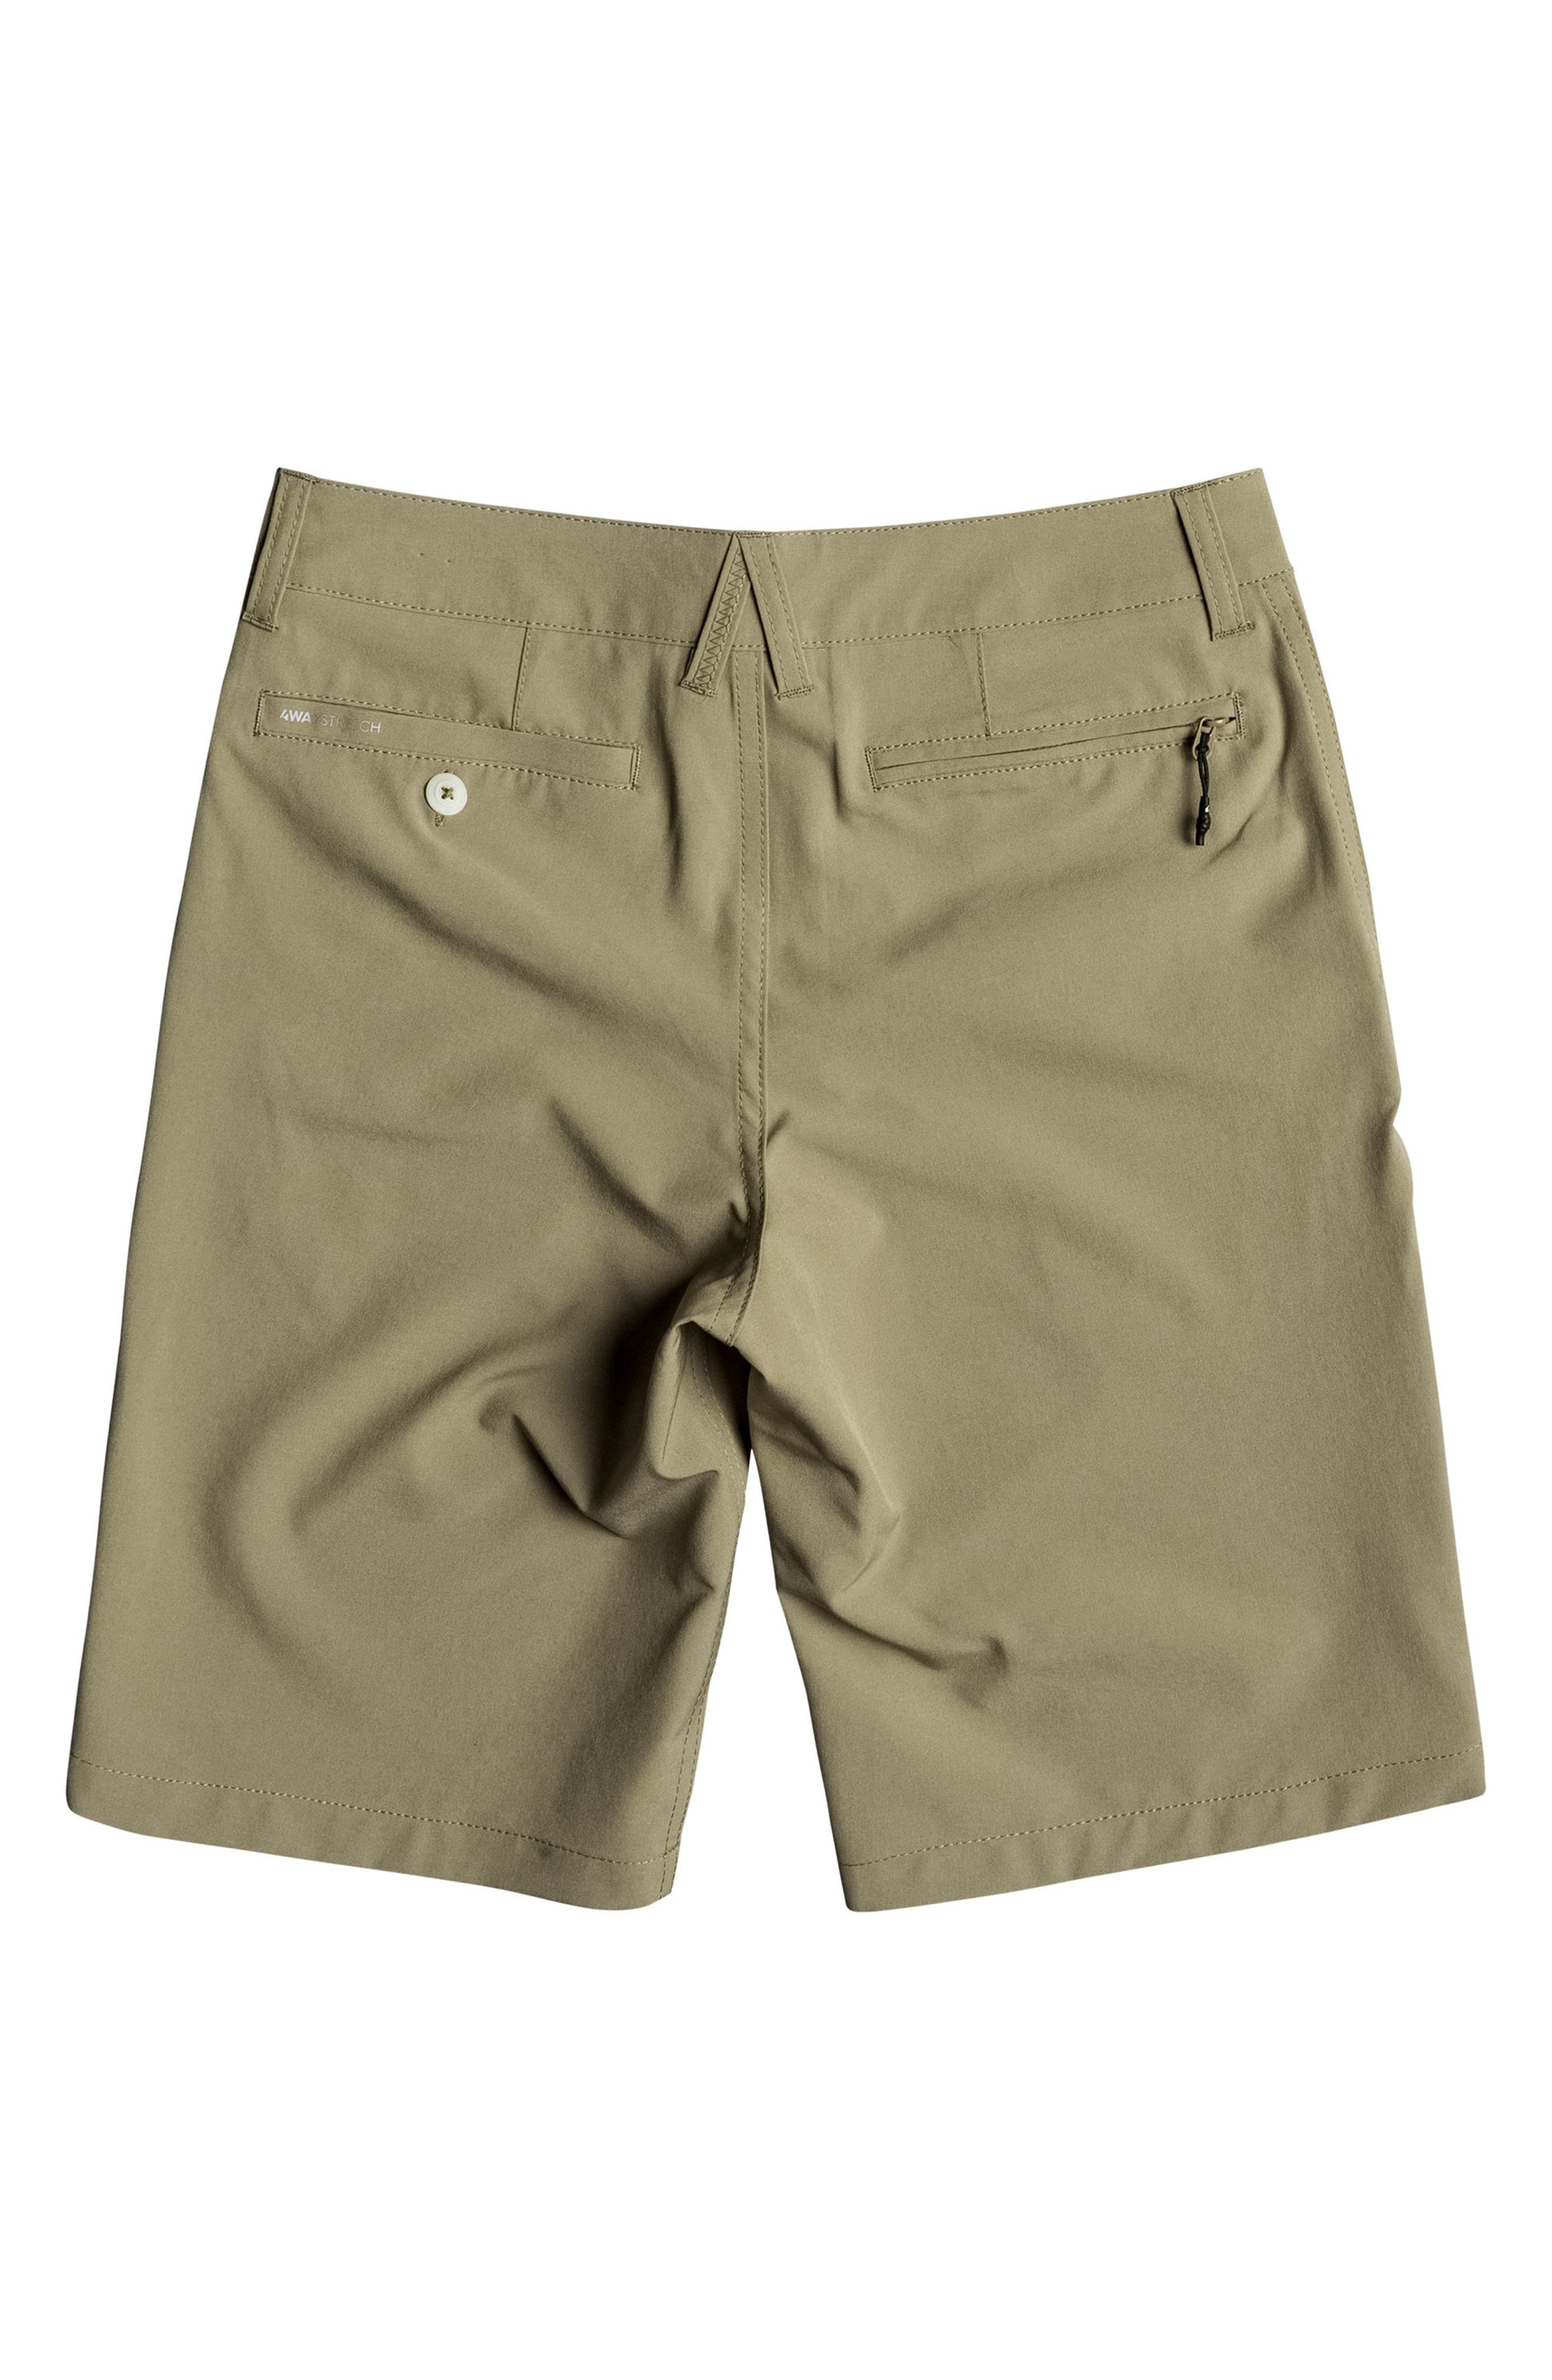 Union Amphibian Board Shorts,                             Alternate thumbnail 2, color,                             Elmwood